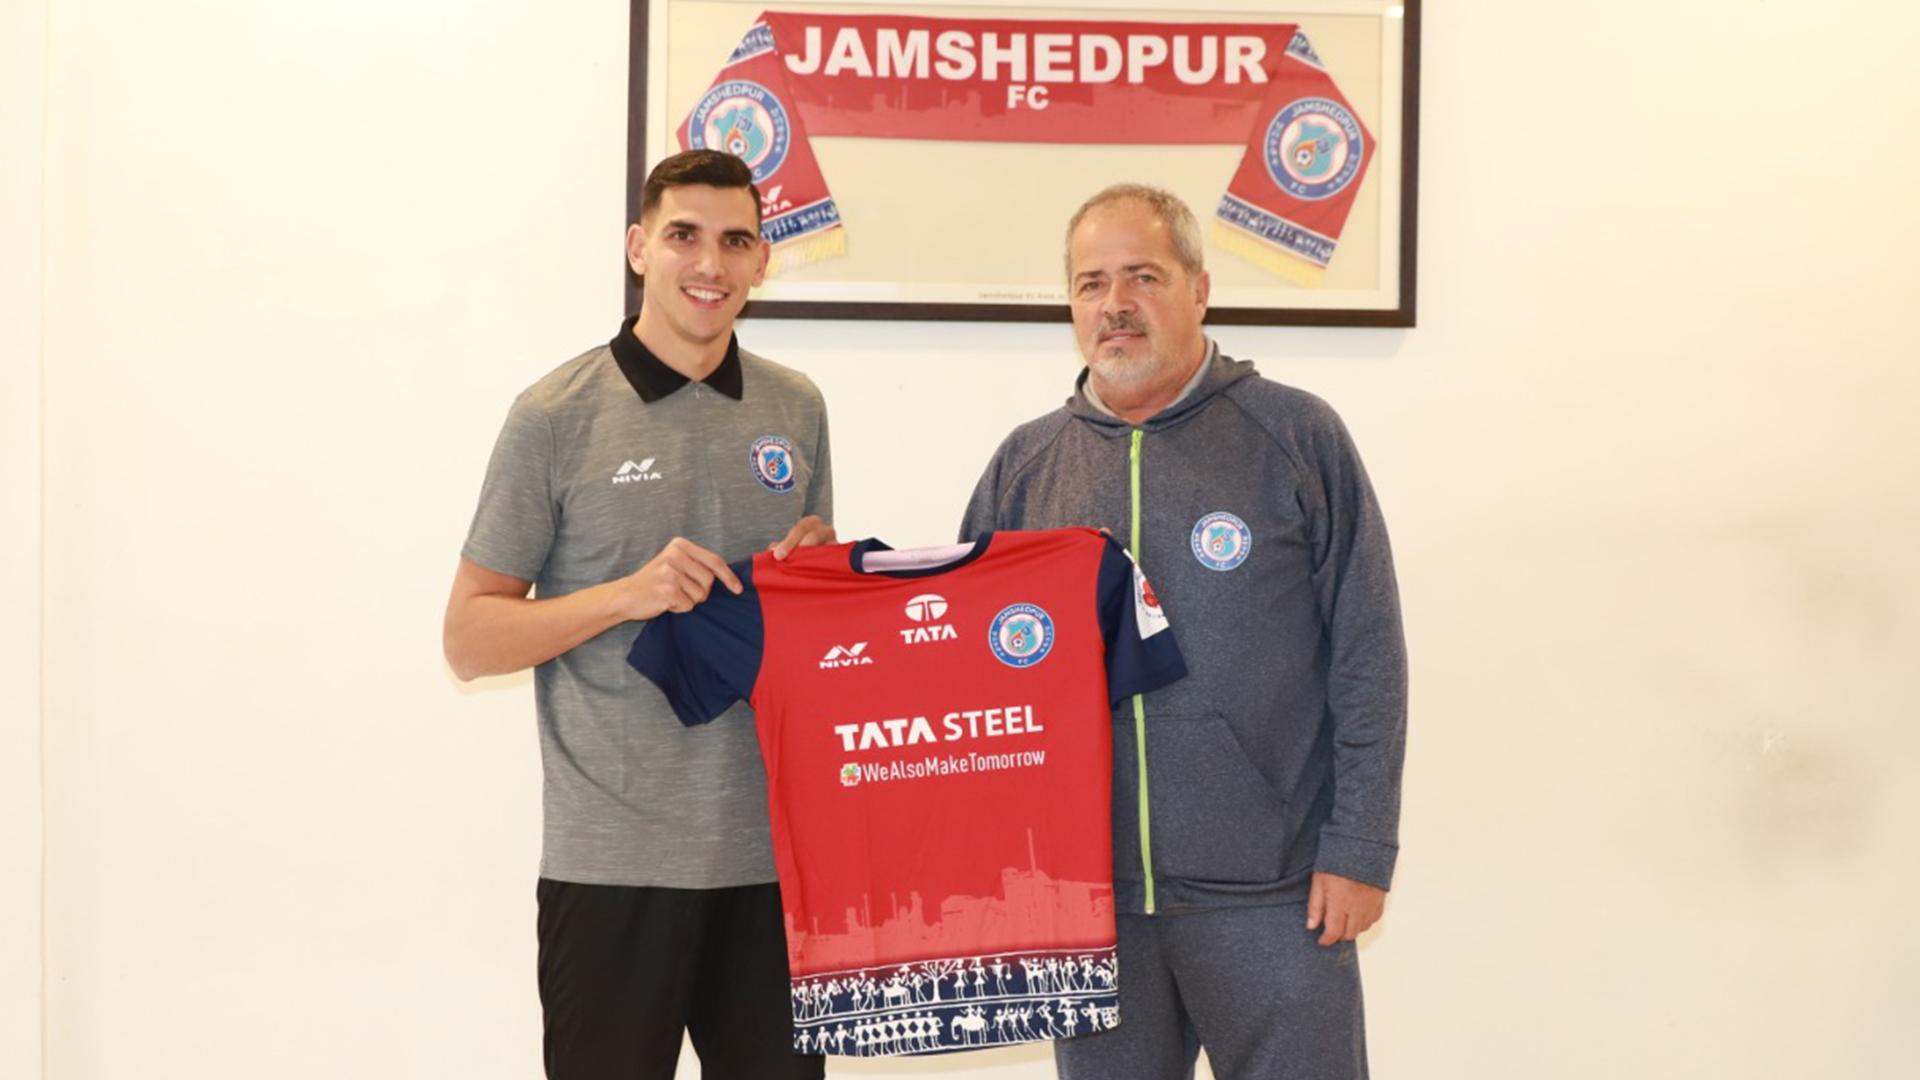 Jamshedpur FC sign Spanish forward David Grande